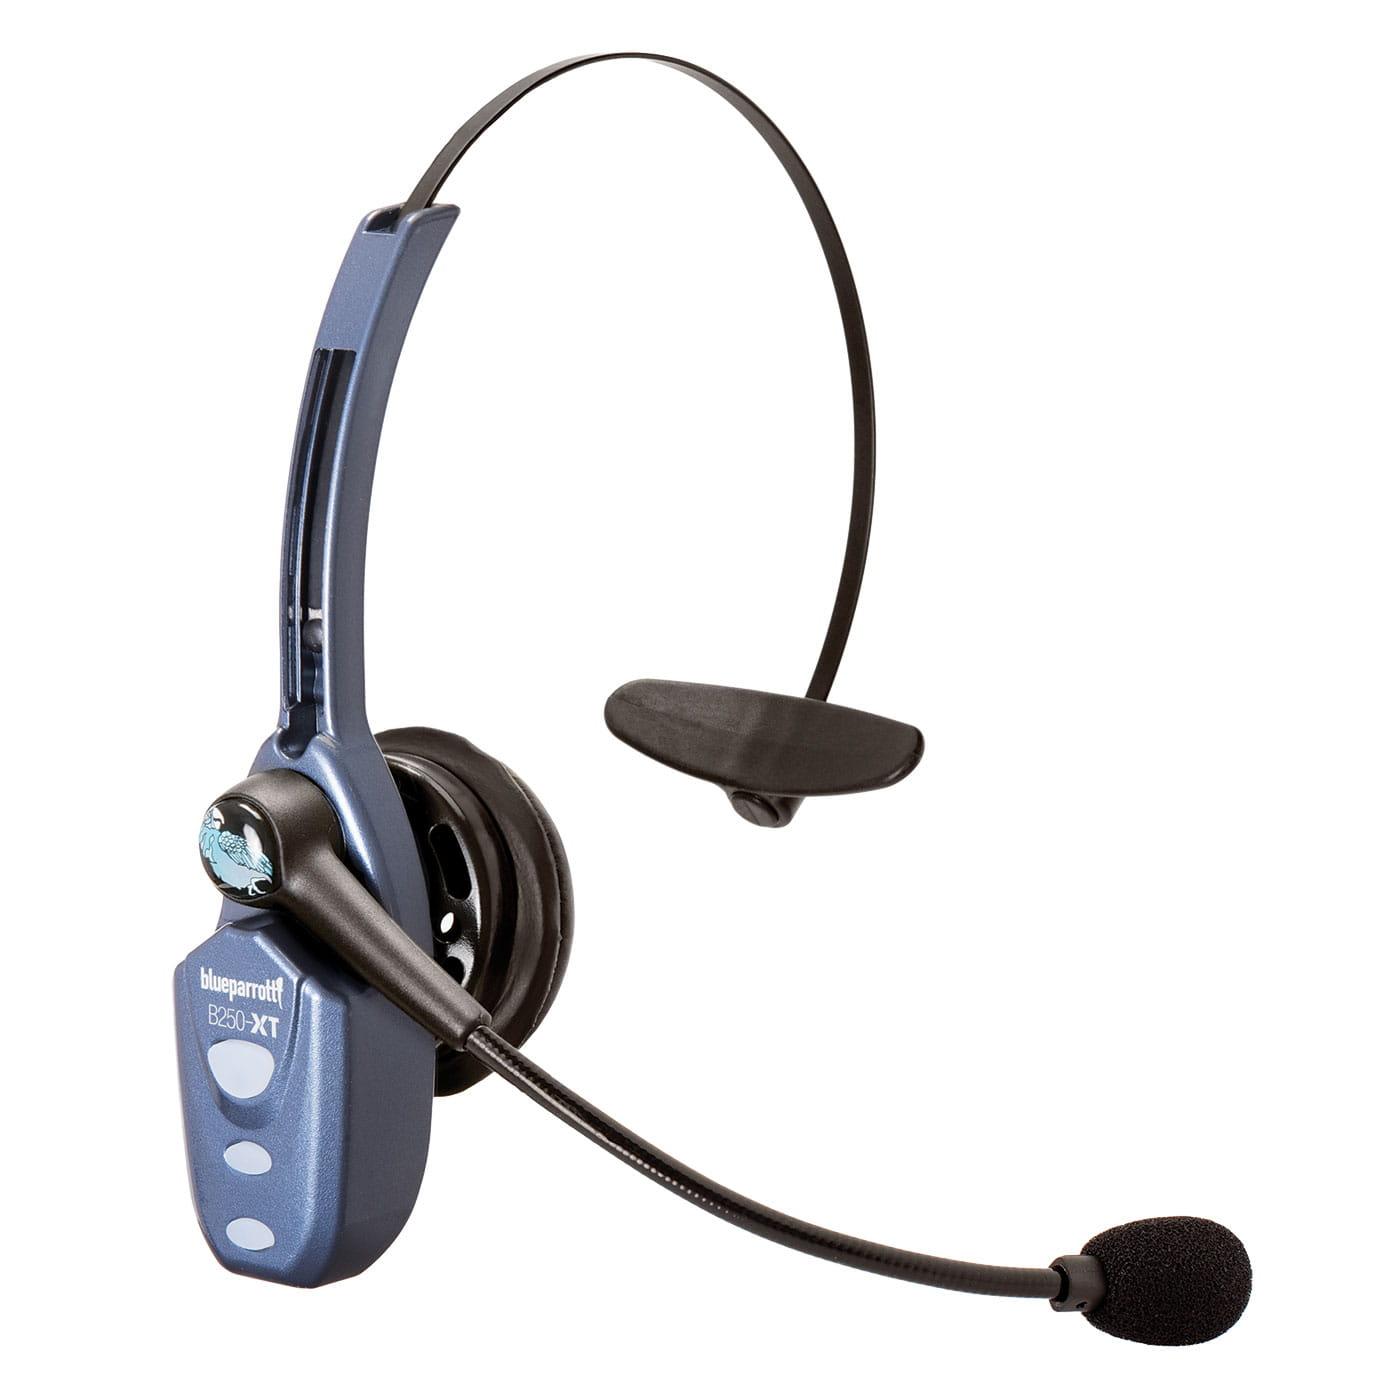 Blueparrott B250 Xt